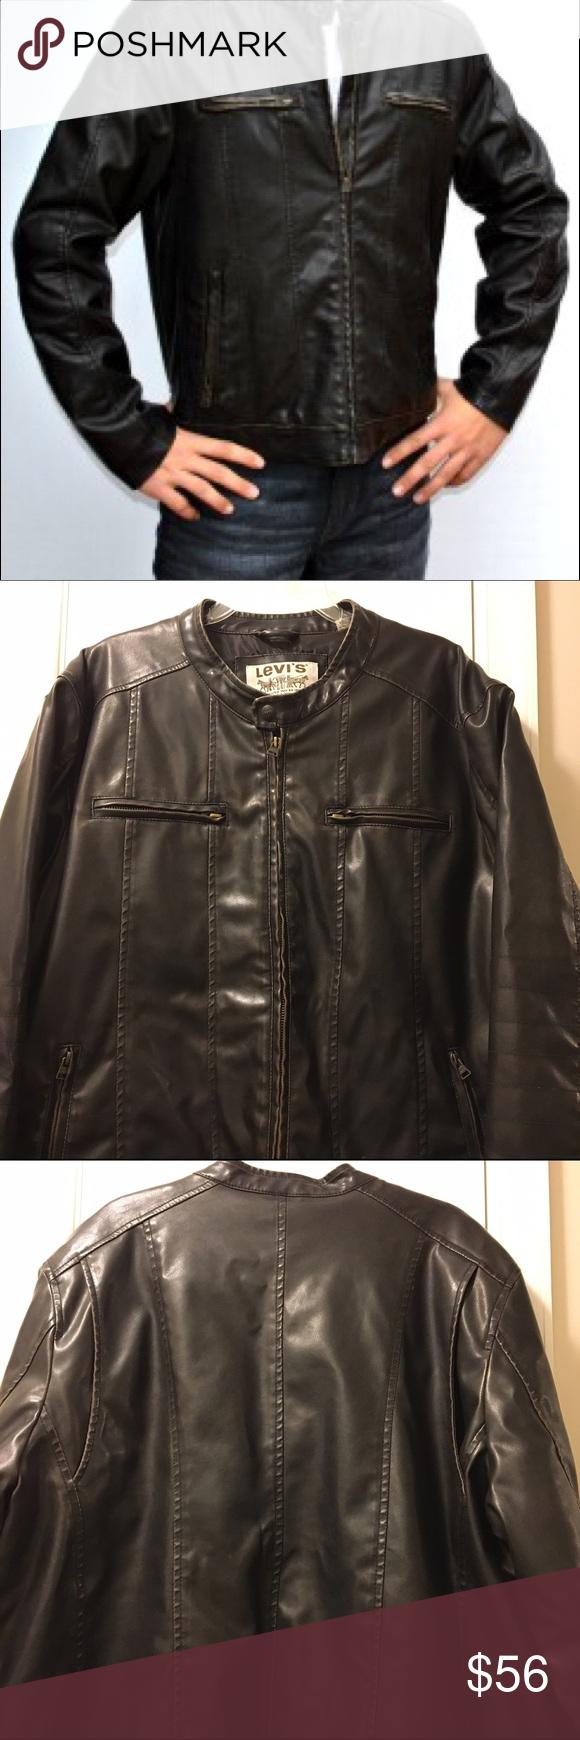 Men's Levi's Vegan Leather Motorcycle Jacket Brown vegan